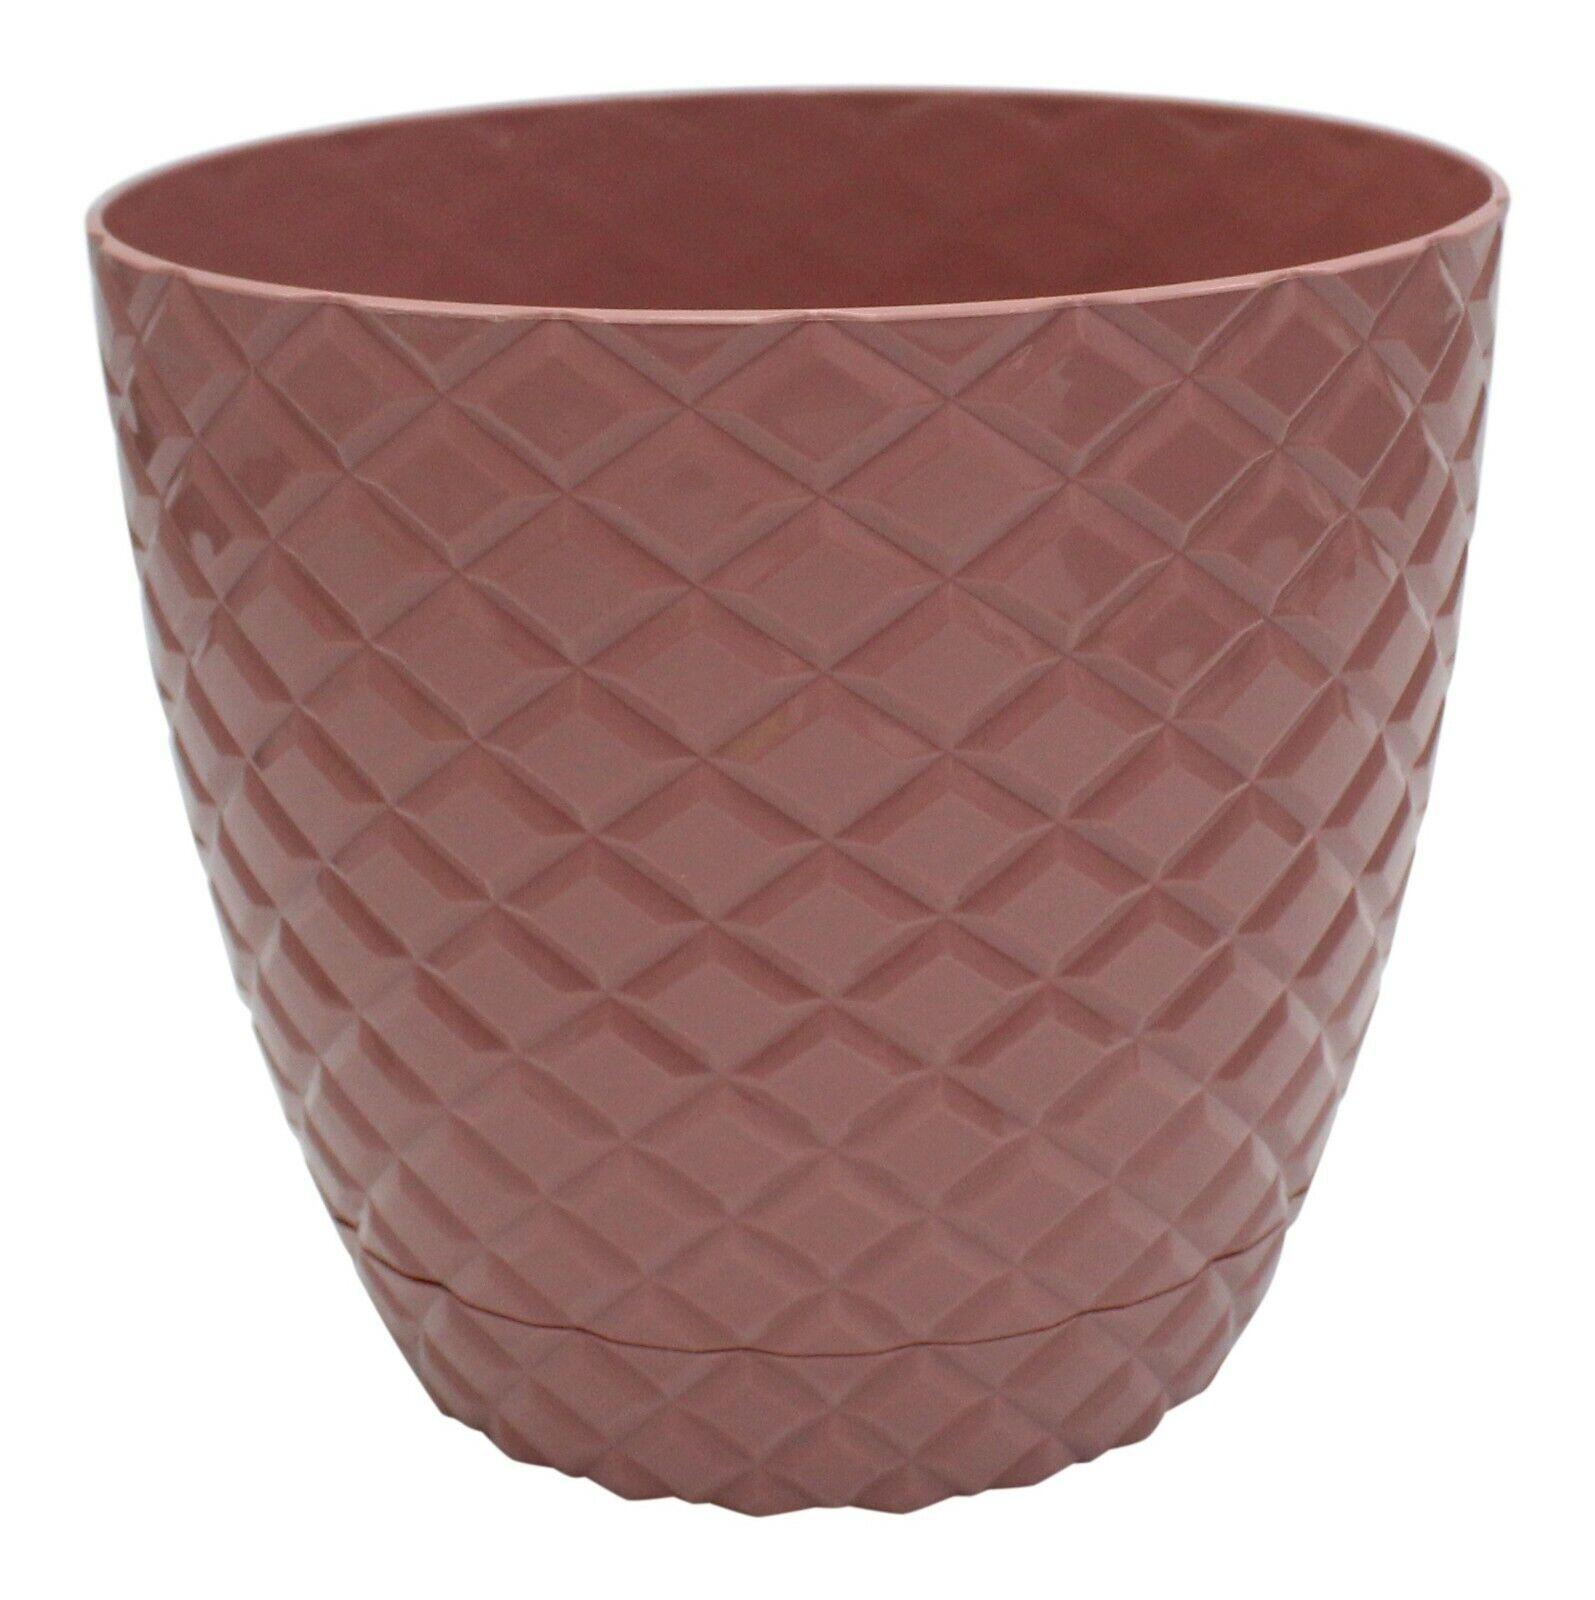 Pink Diamond Cut Modern Large Plant Pot Indoor / Outdoor 5.6 Litre Planter